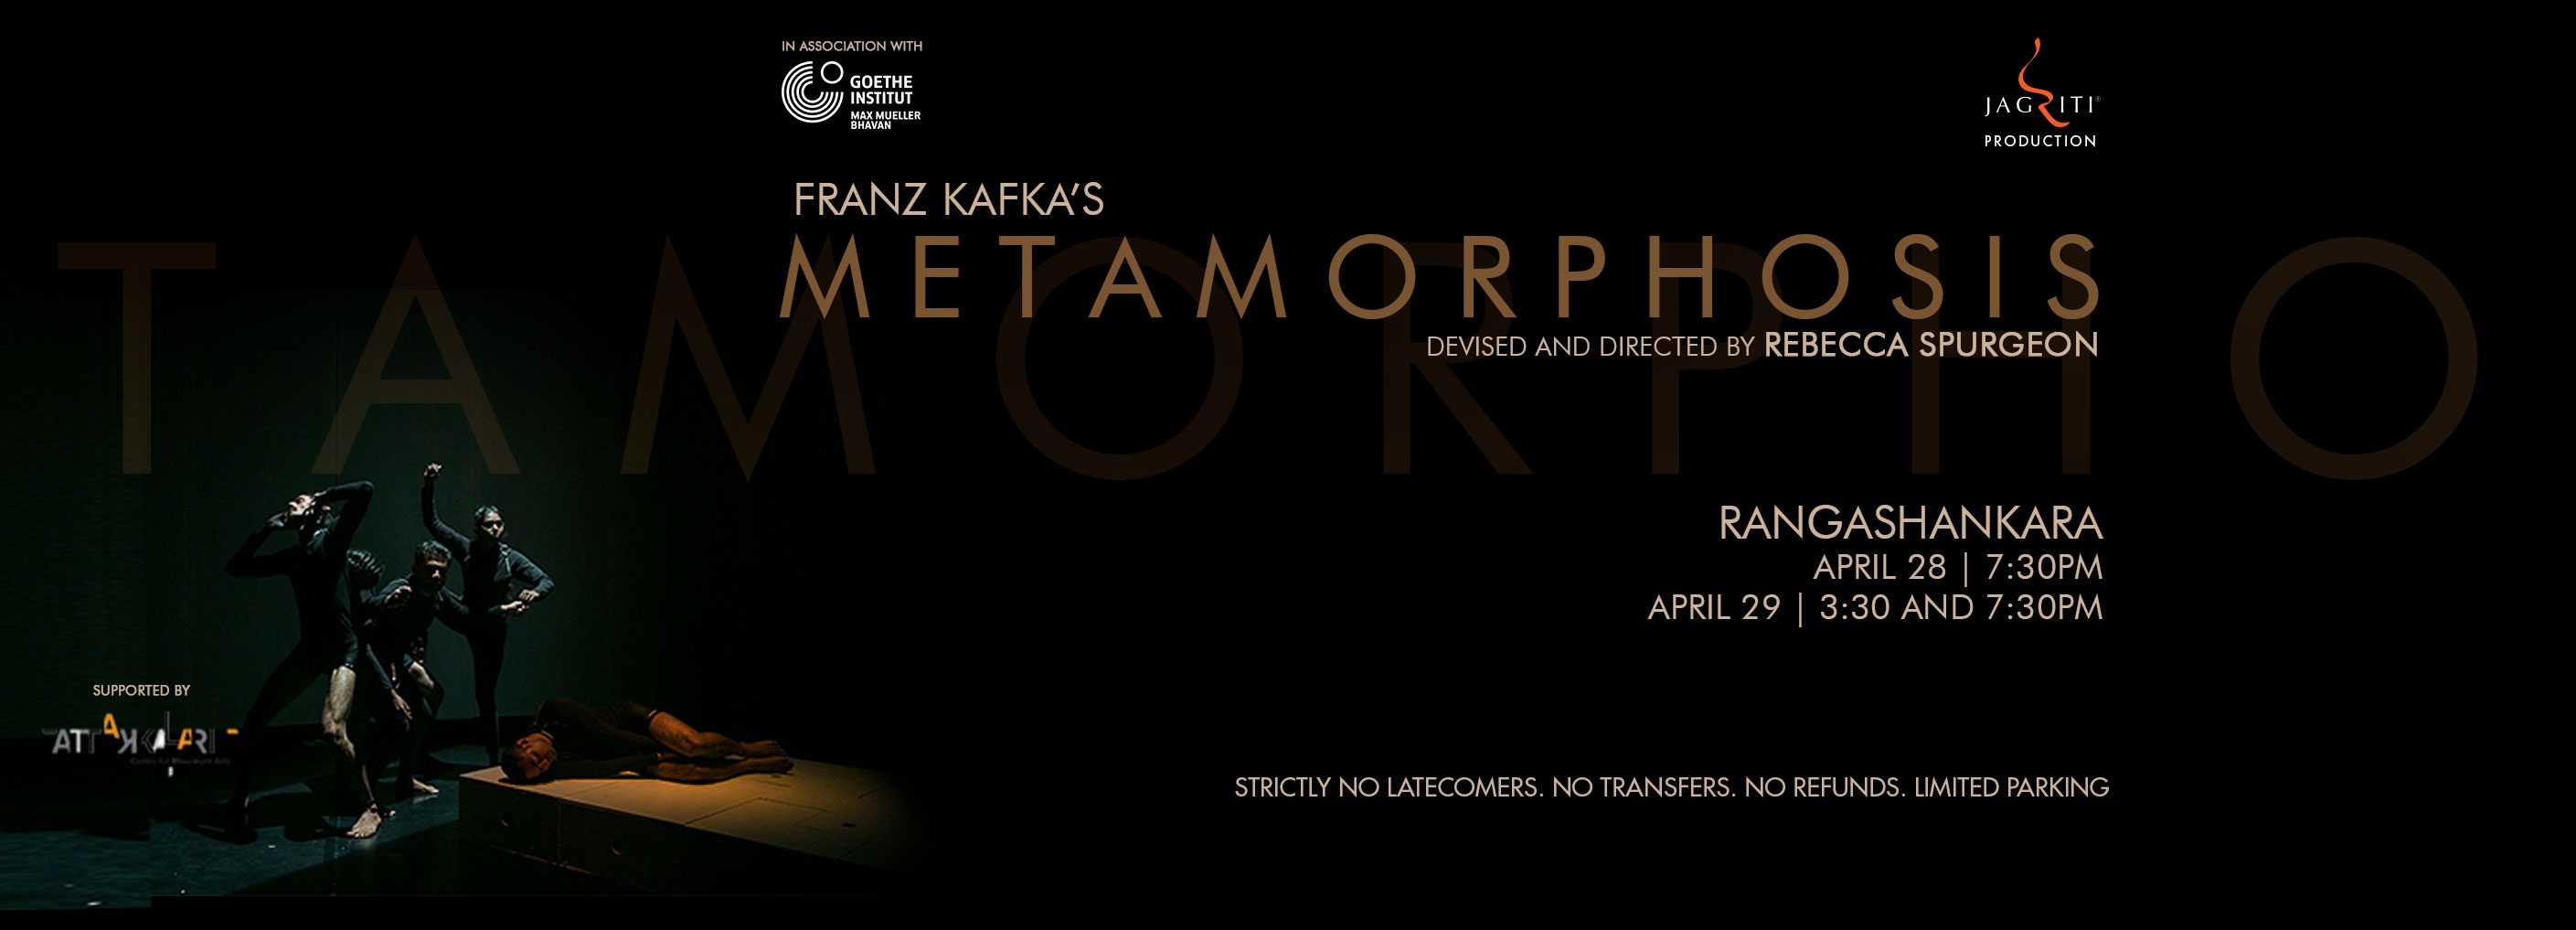 Franz Kafka's - Metamorphosis